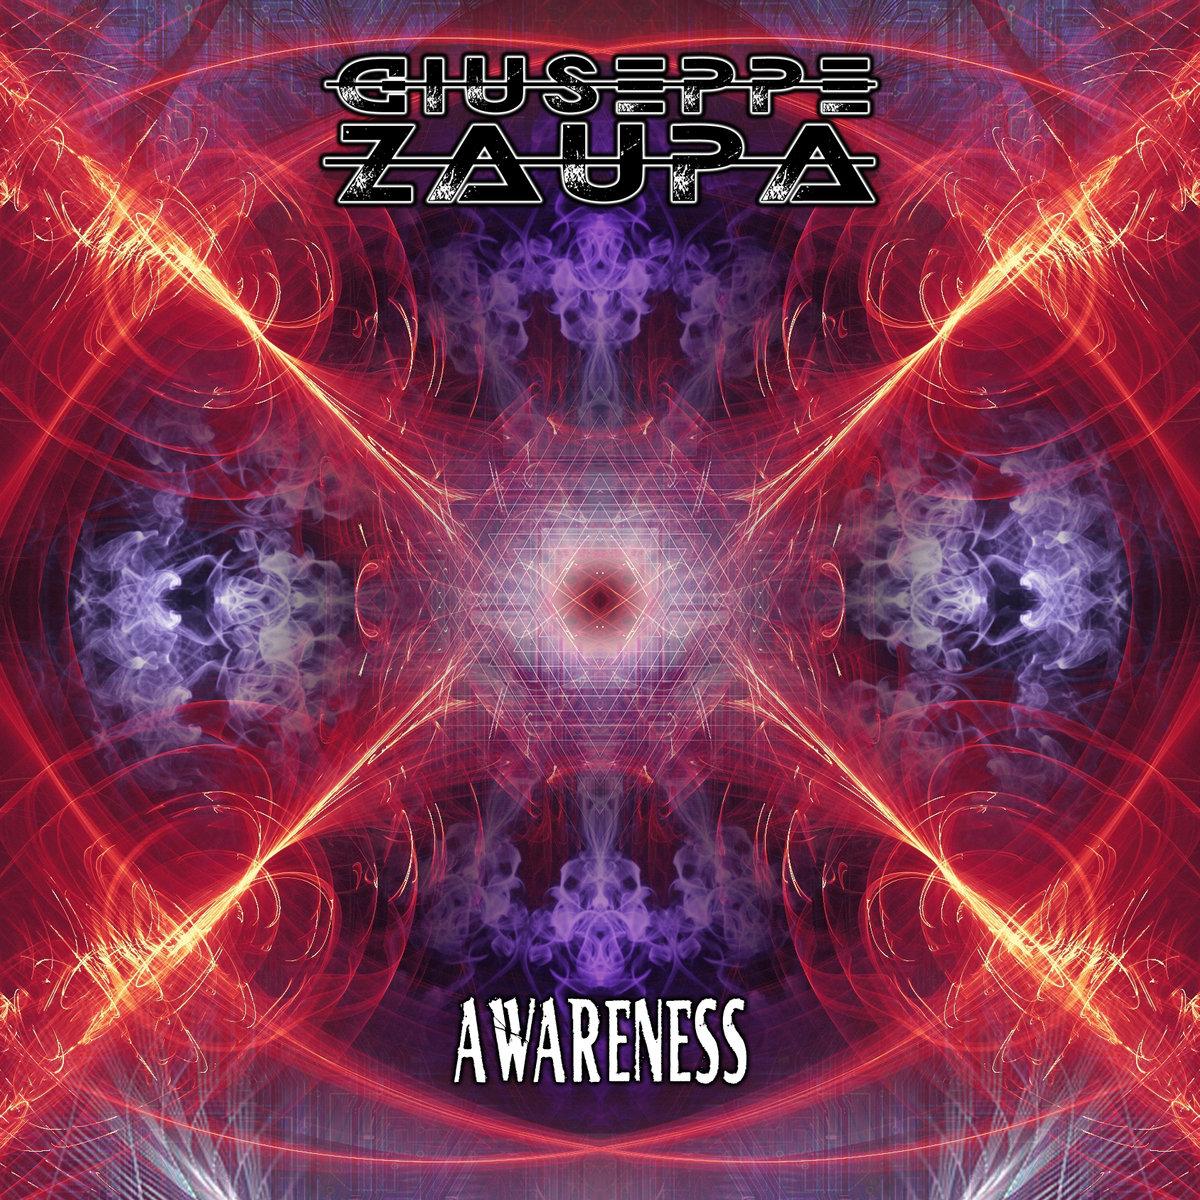 Awareness by Giuseppe Zaupa